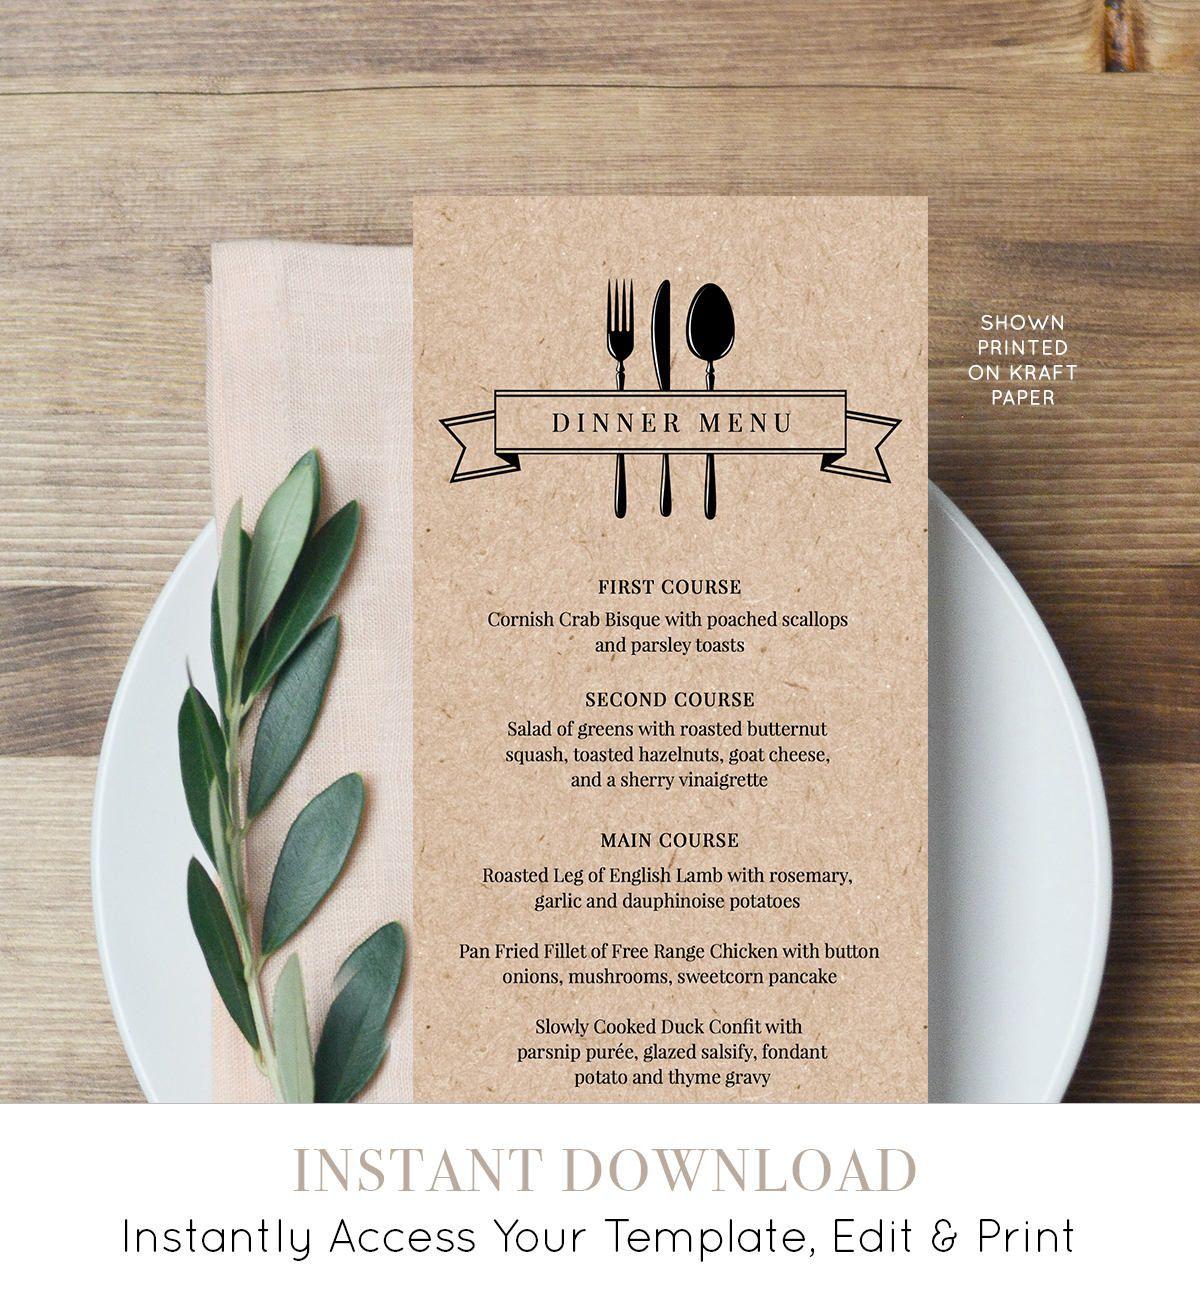 006 Unbelievable Diy Wedding Menu Template High Resolution  Free CardFull